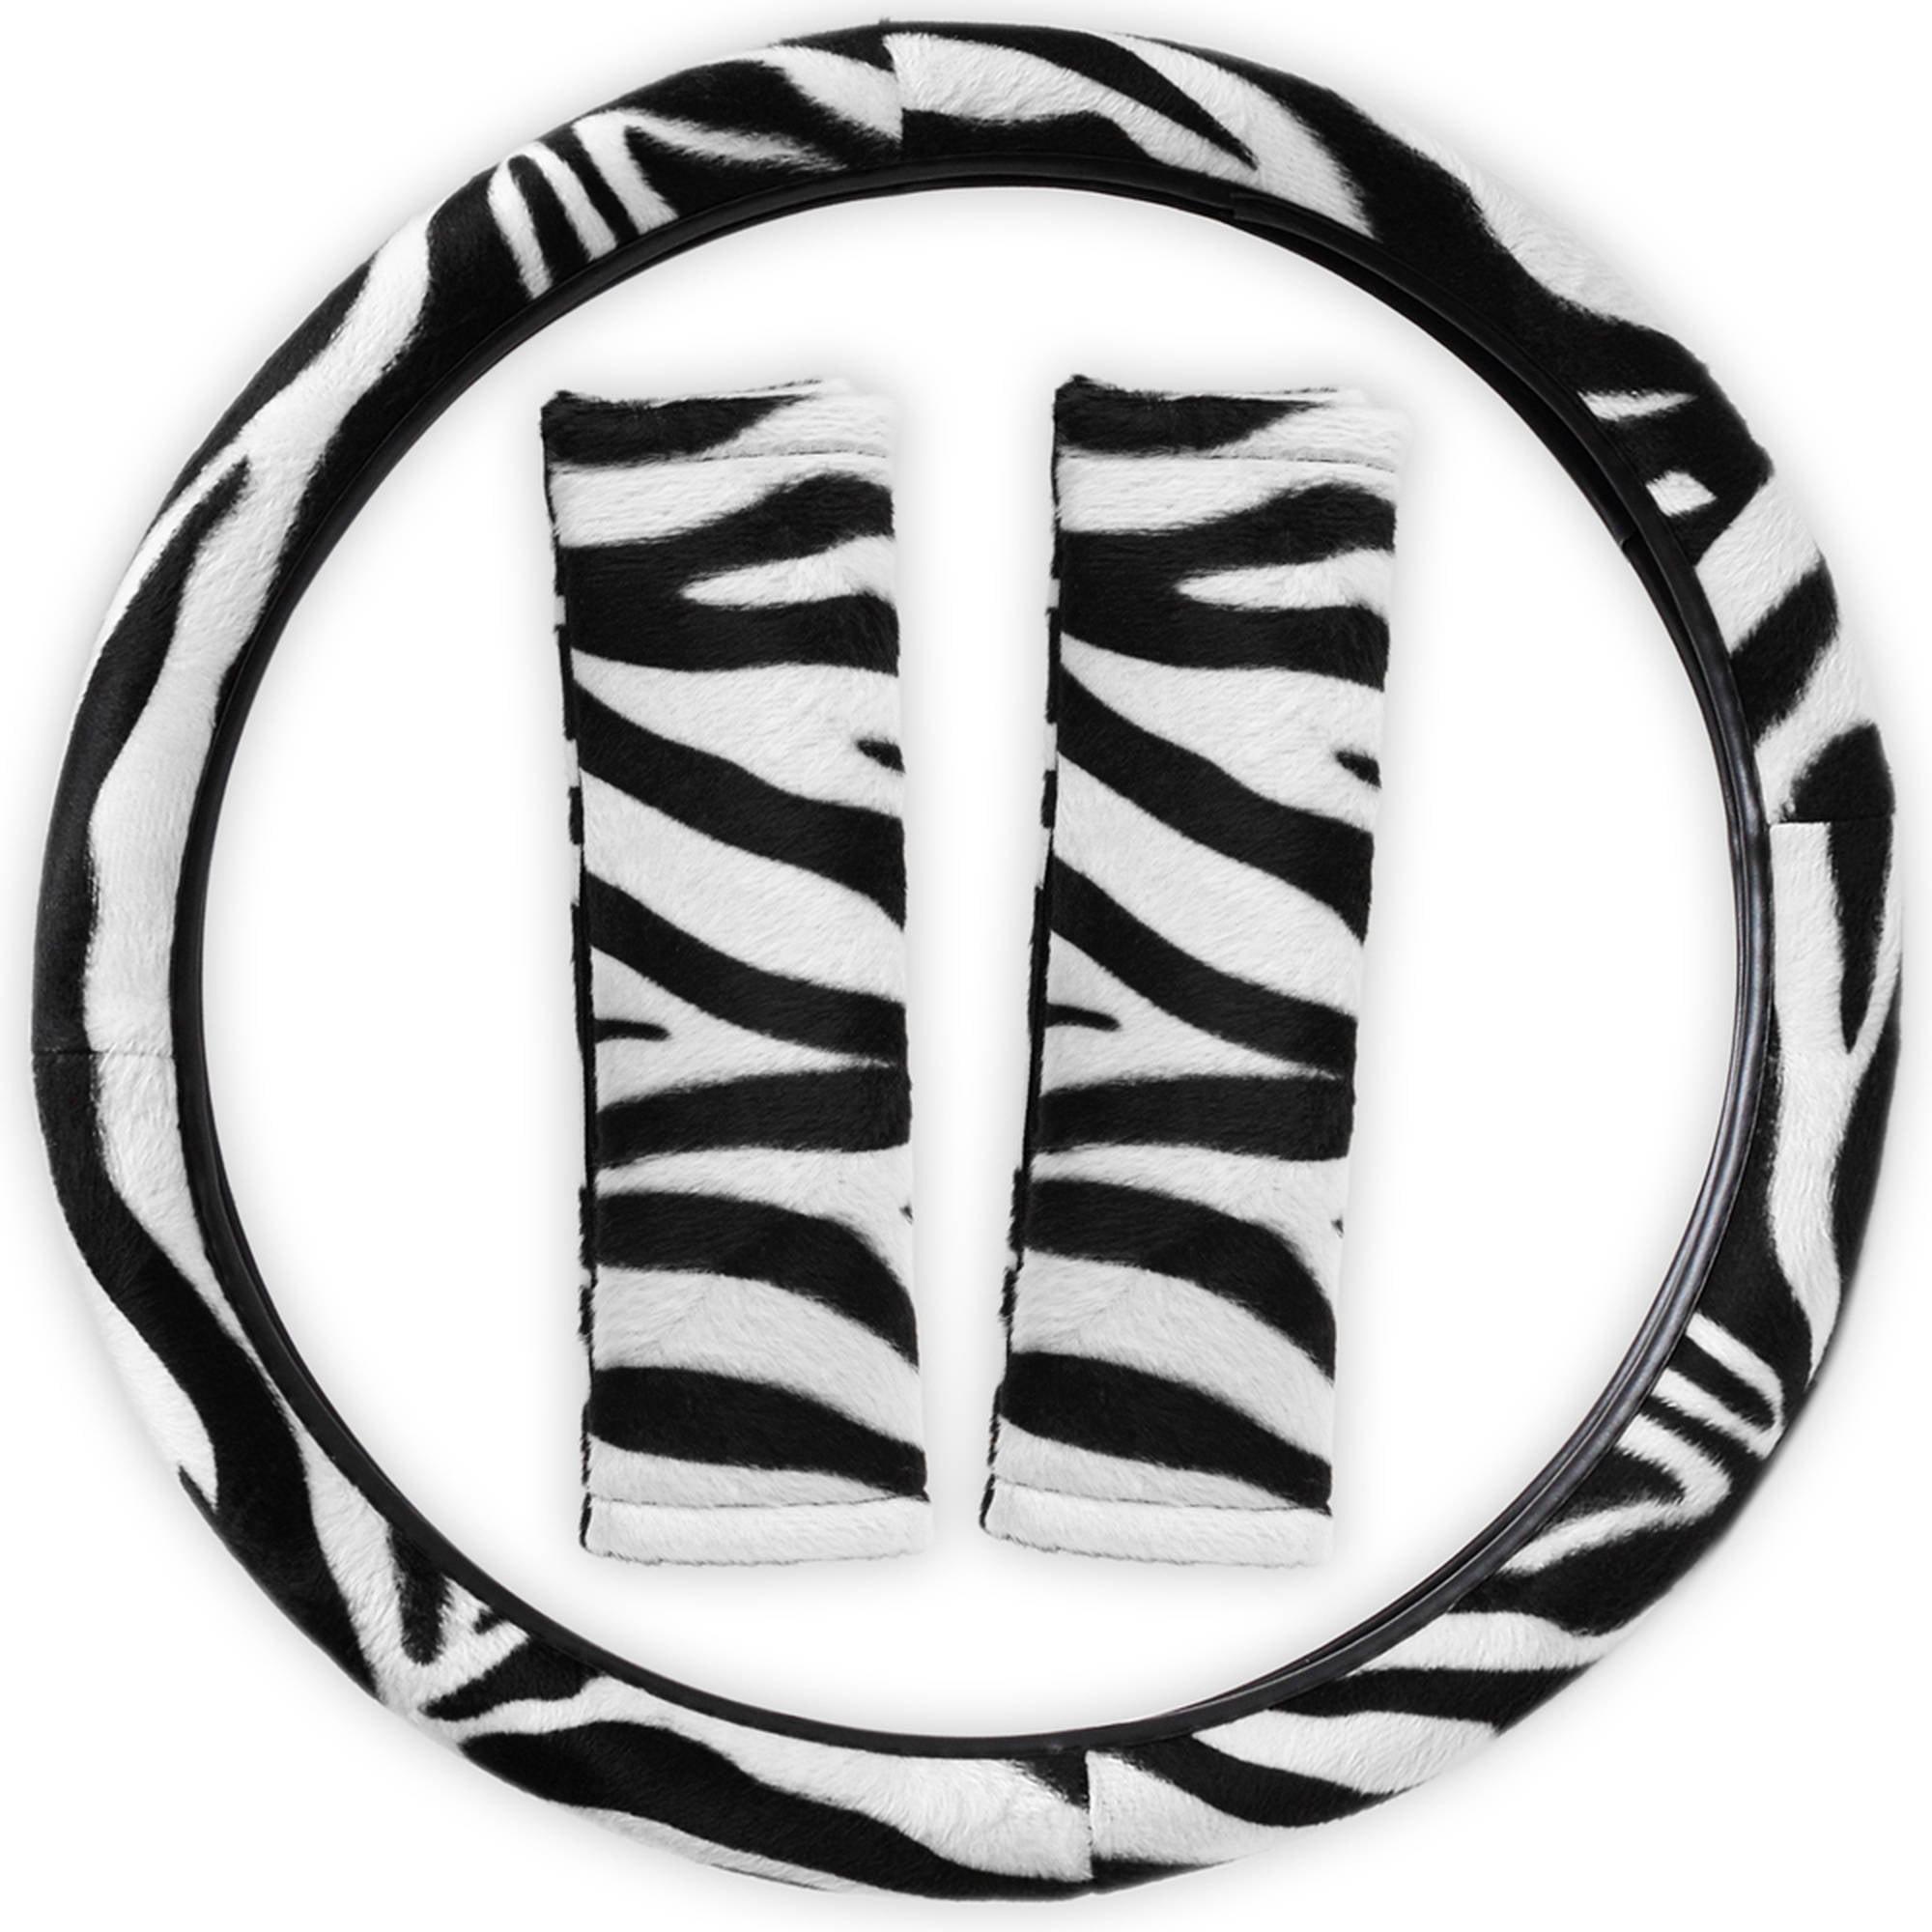 Zebra Print Rainbow Steering Wheel Cover Universal Fit for Car/Truck/Van/SUV